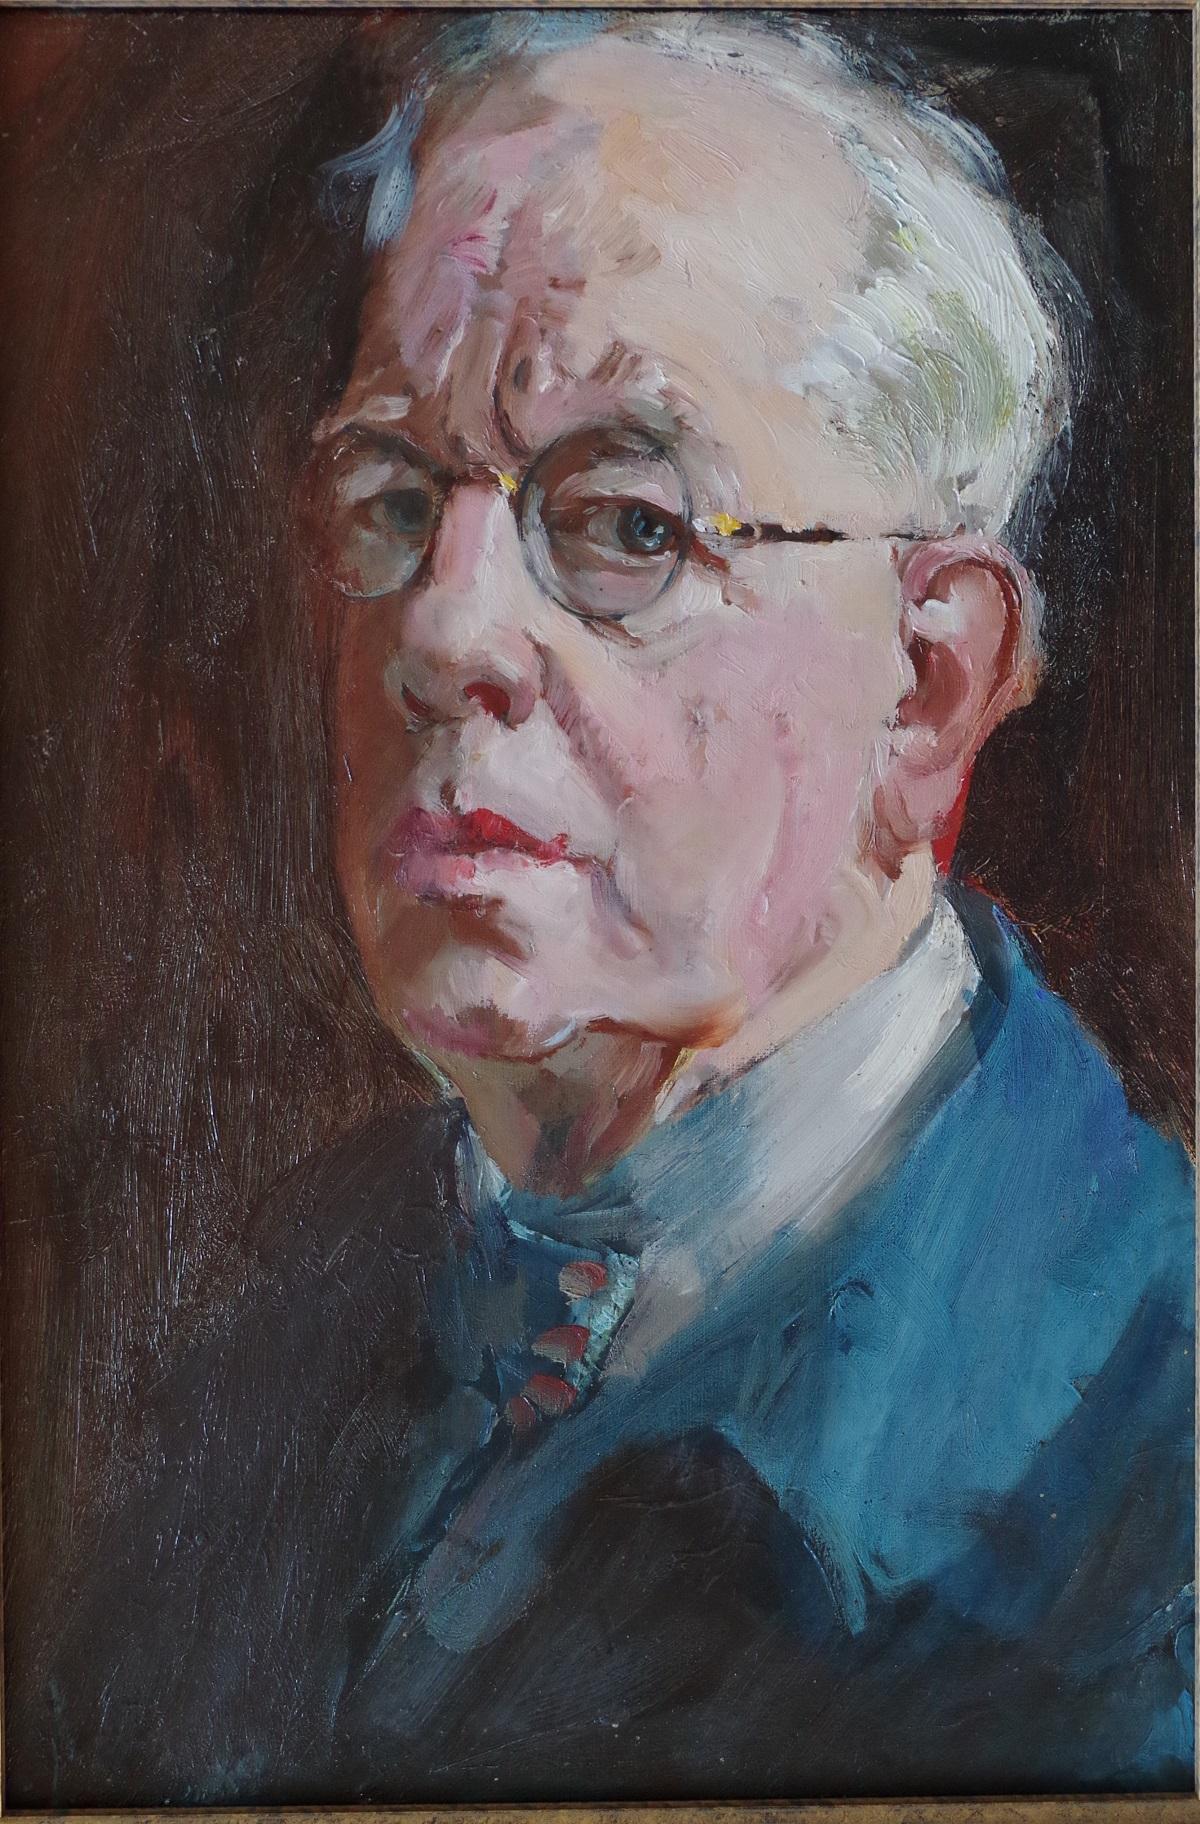 Knighton-Hammond self-portrait